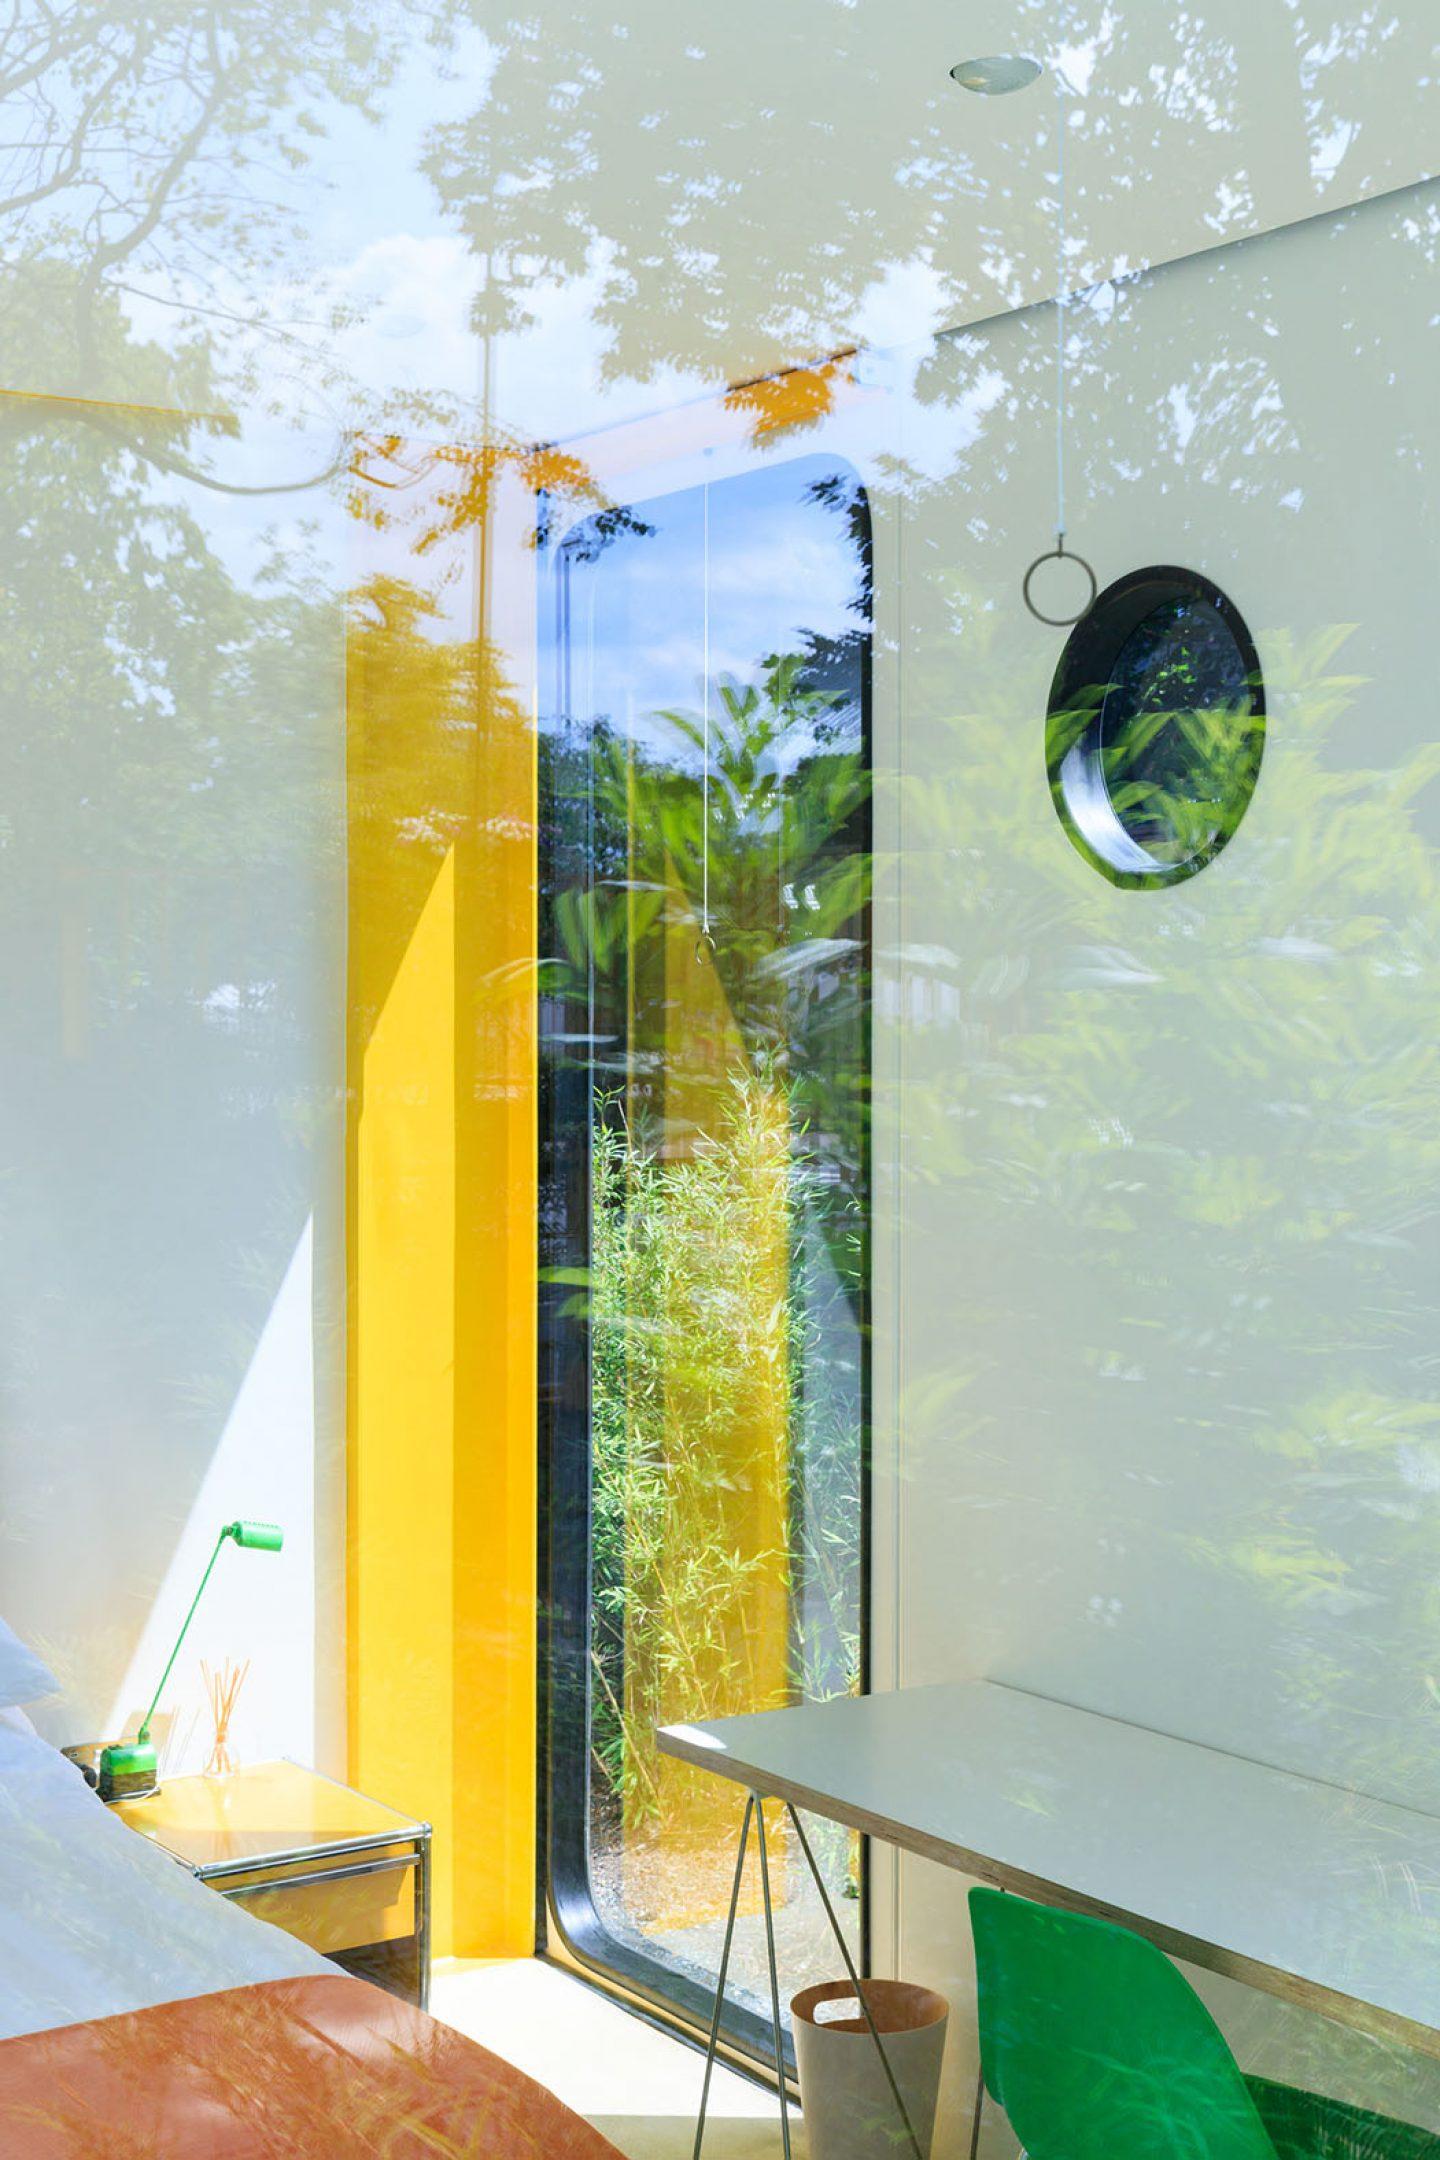 iGNANT_Architecture_Philip_Gumuchdjian_ Todd_Longstaffe_Gowan_Parkside_Wimbledon_House01